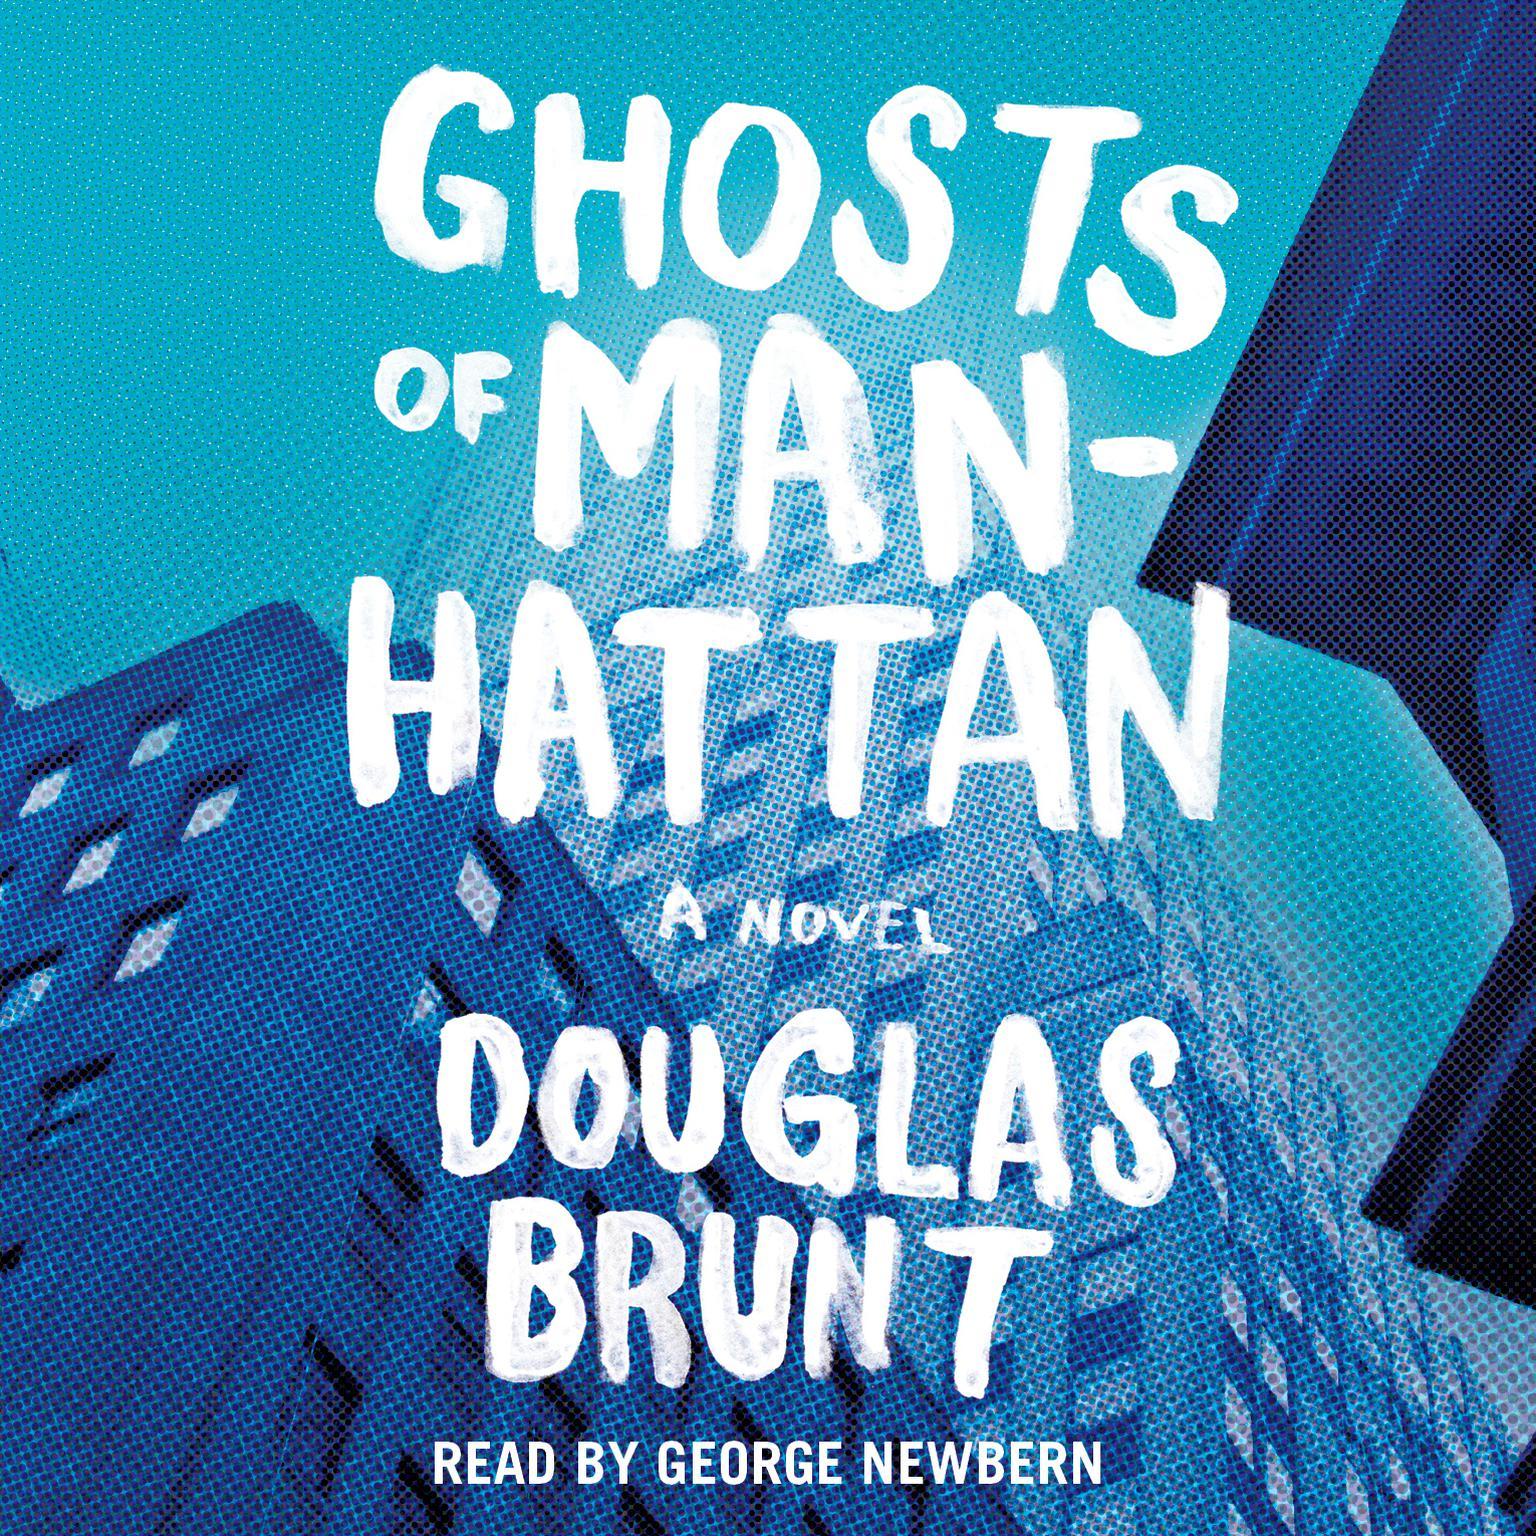 Ghosts of Manhattan: A Novel Audiobook, by Douglas Brunt